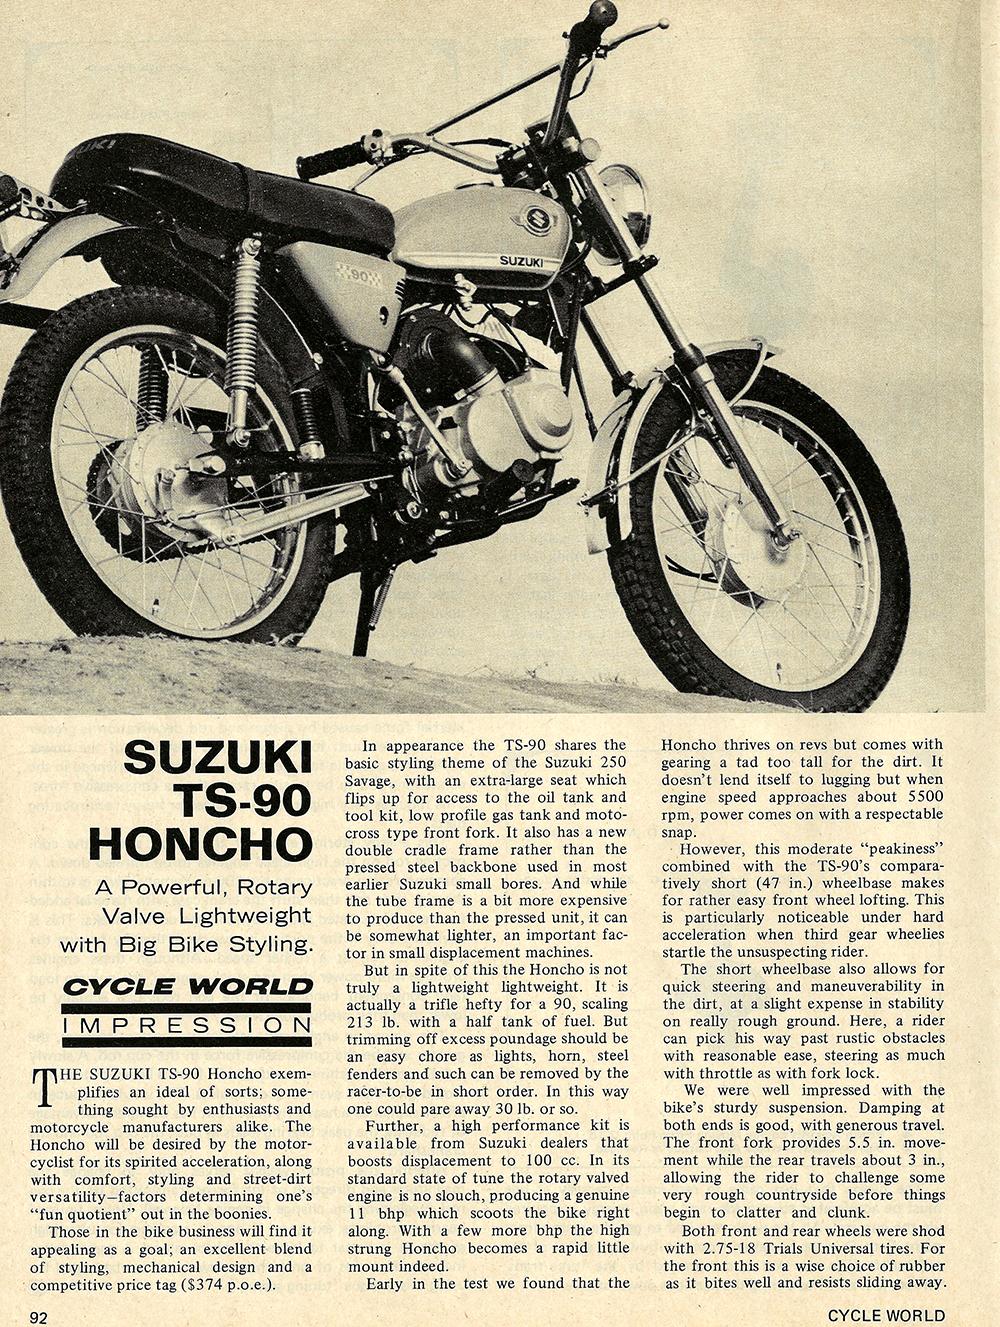 1970 Suzuki TS90 Honcho road test 01.jpg